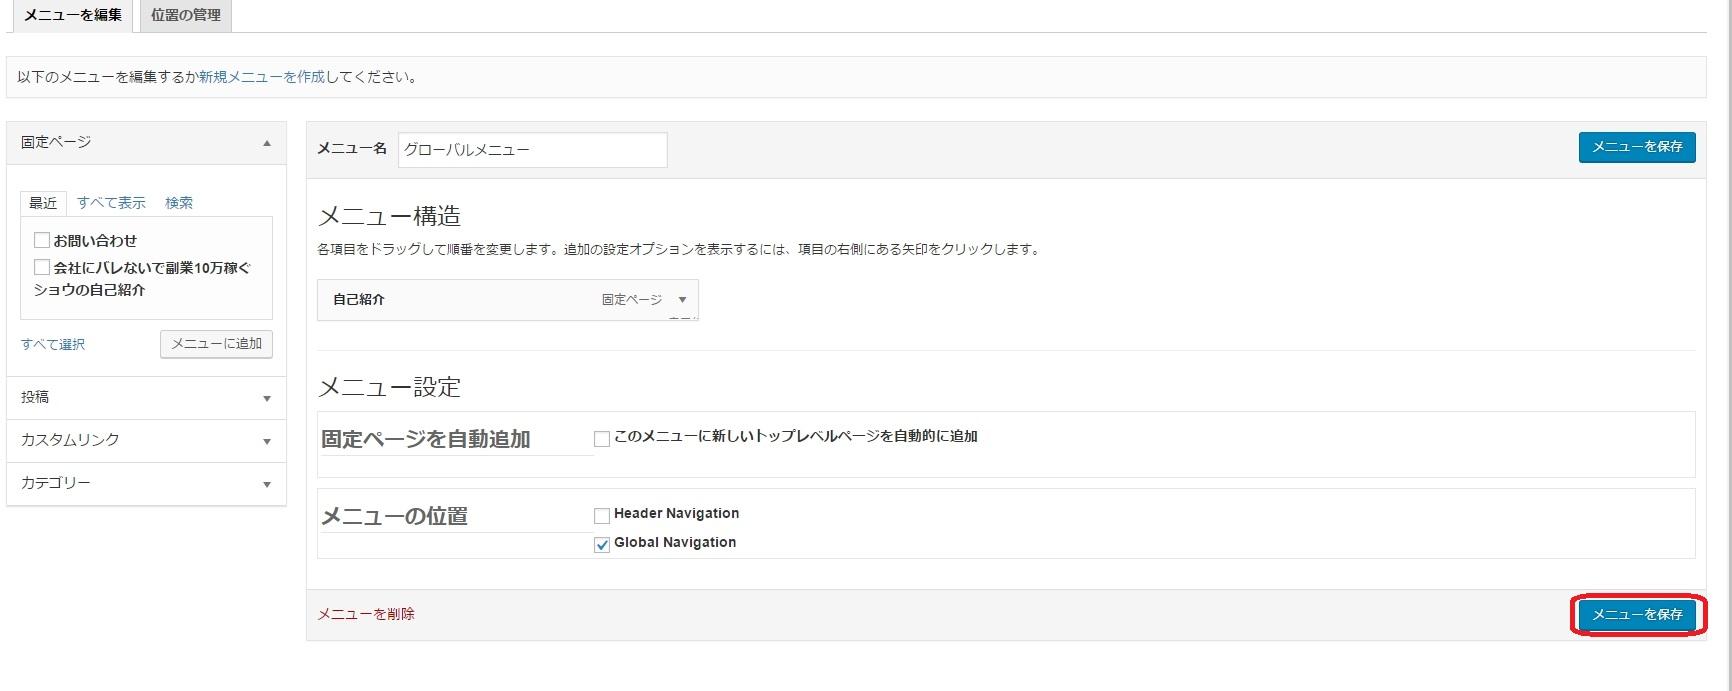 button-only@2x ワードプレスのグローバルメニューの作成・設置方法